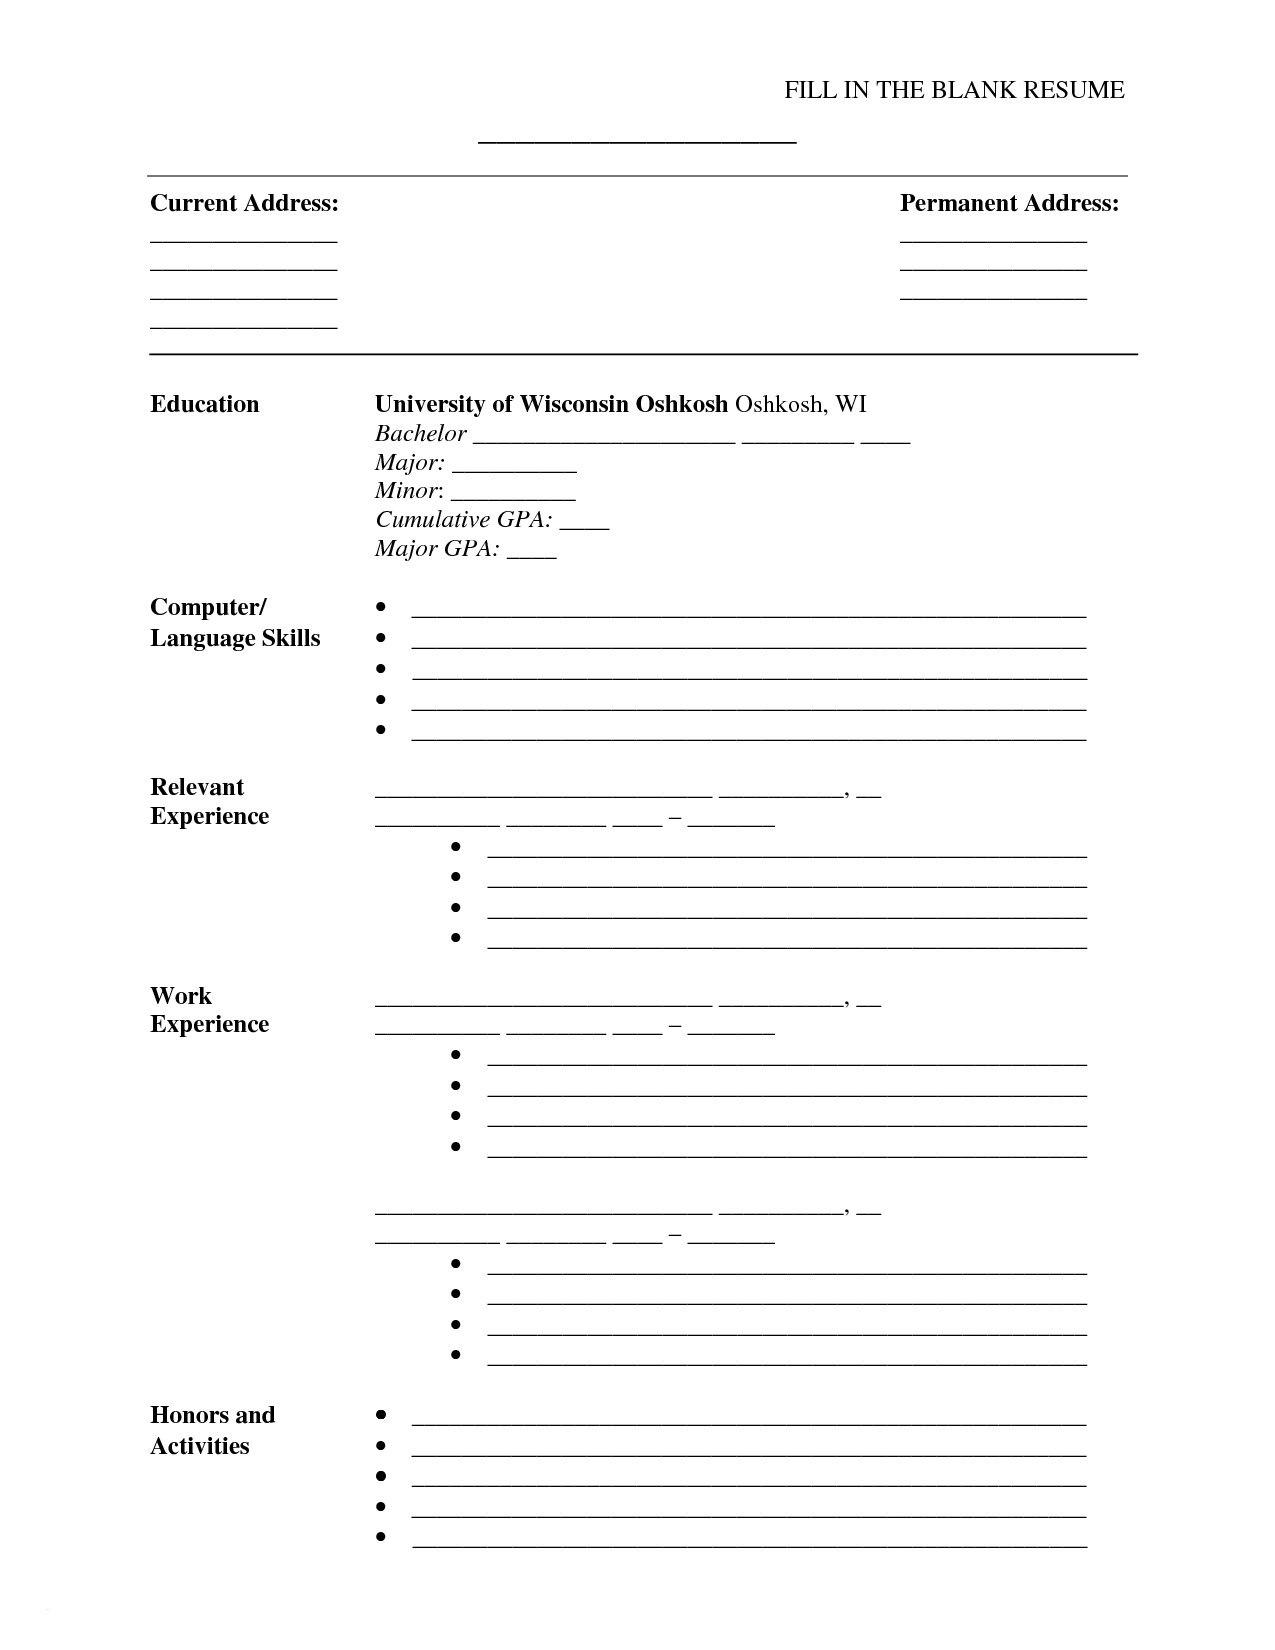 Printable Resume Maker - Tjfs-Journal - Free Printable Resume Templates Microsoft Word